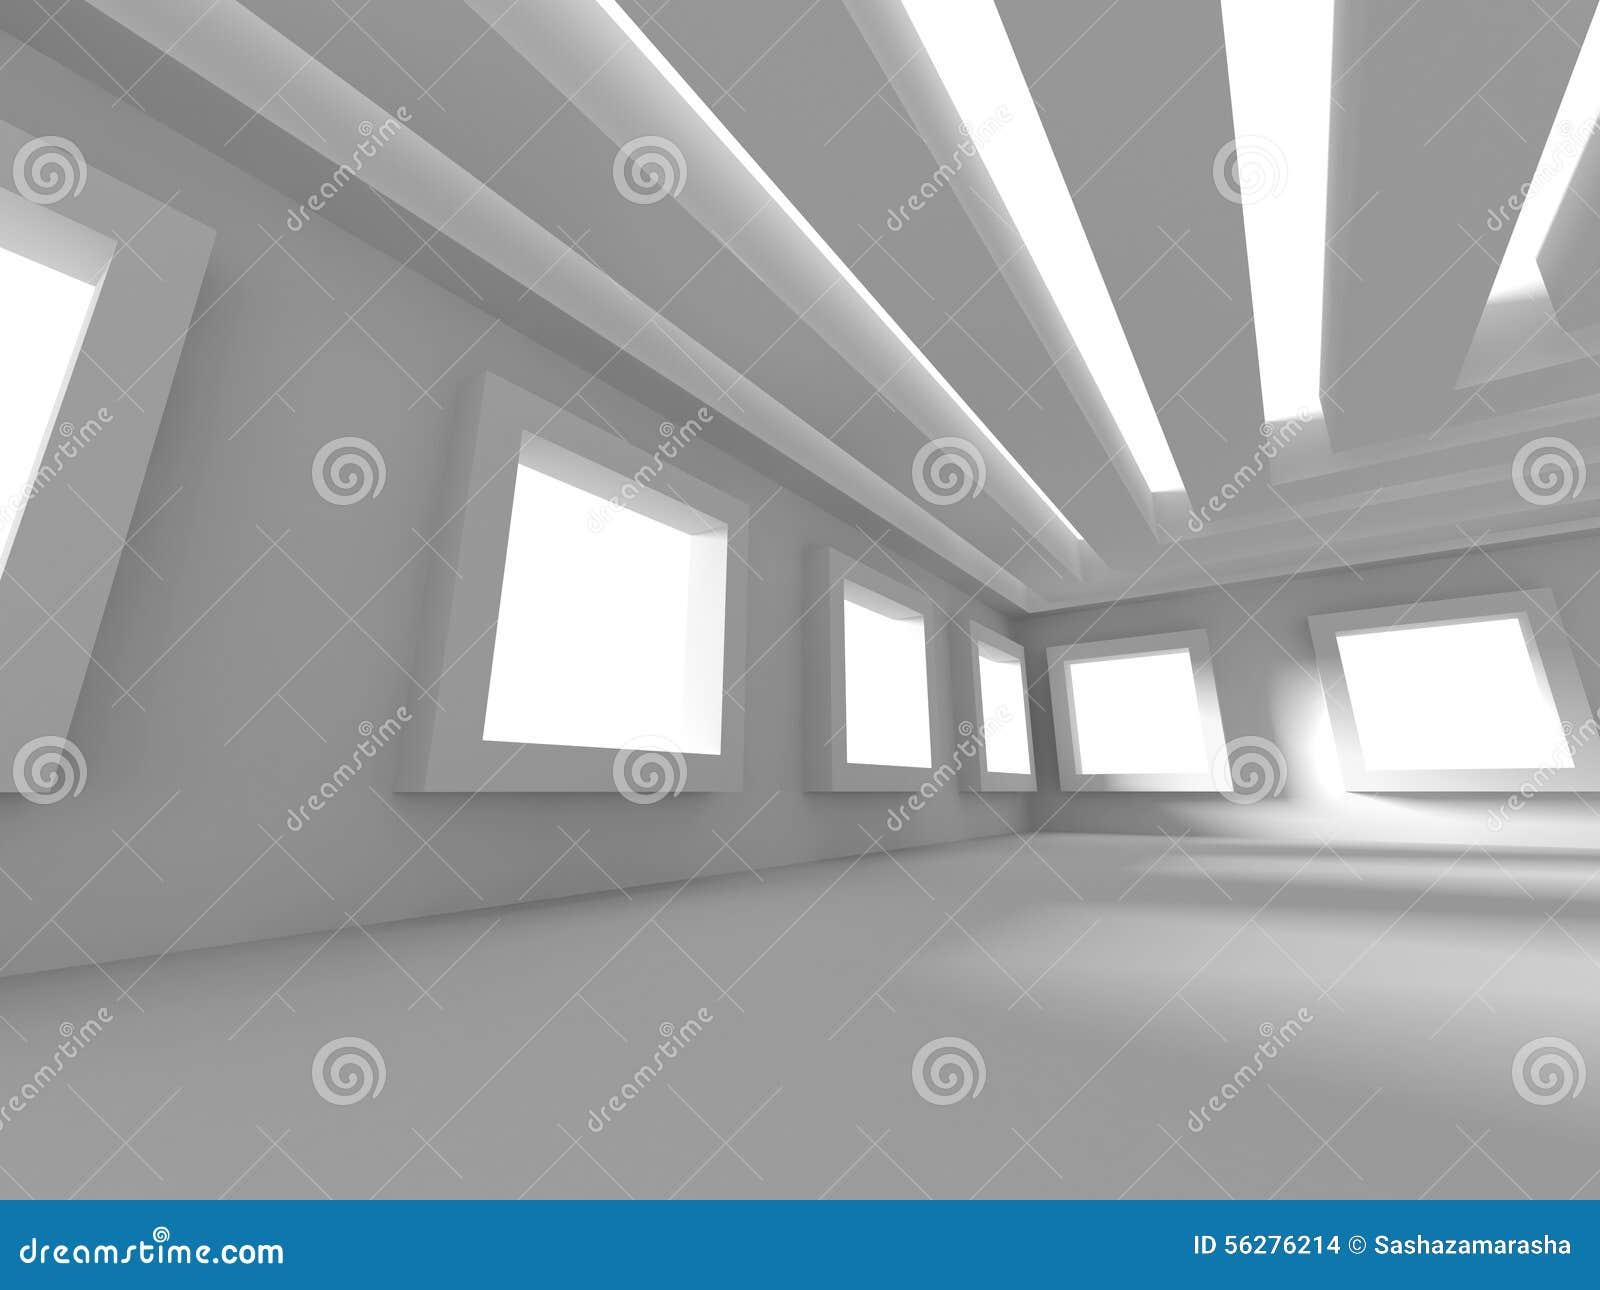 Abstrakter modernes design innenarchitektur hintergrund for Design innenarchitektur